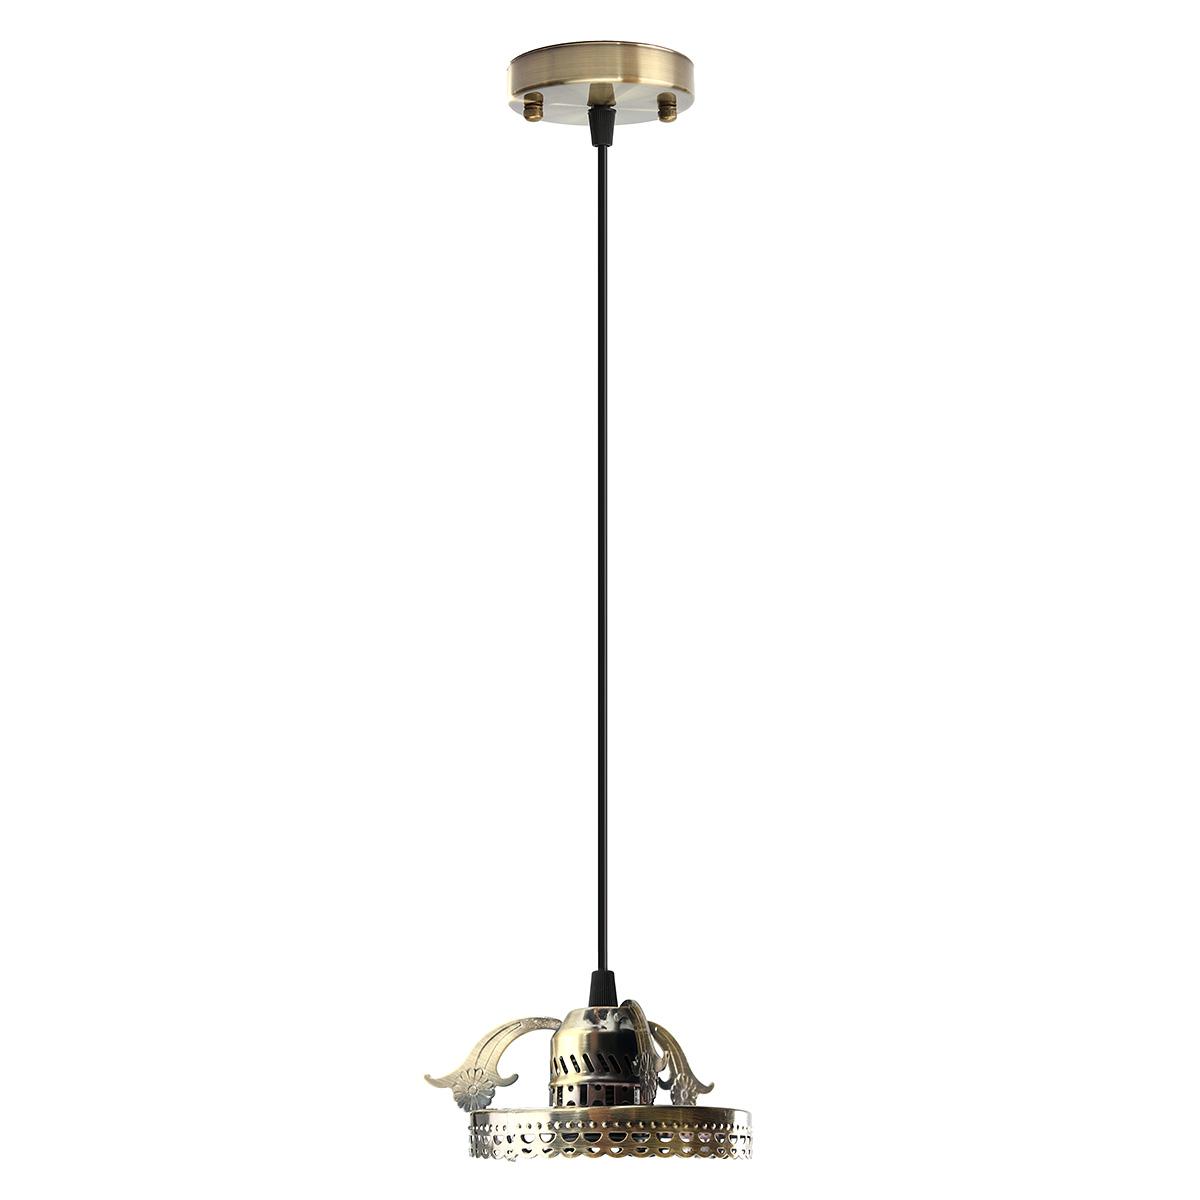 Antique Industrial Vintage Ceiling Pendant Light Lamp Bulb Chandelier Fixture For Indoor